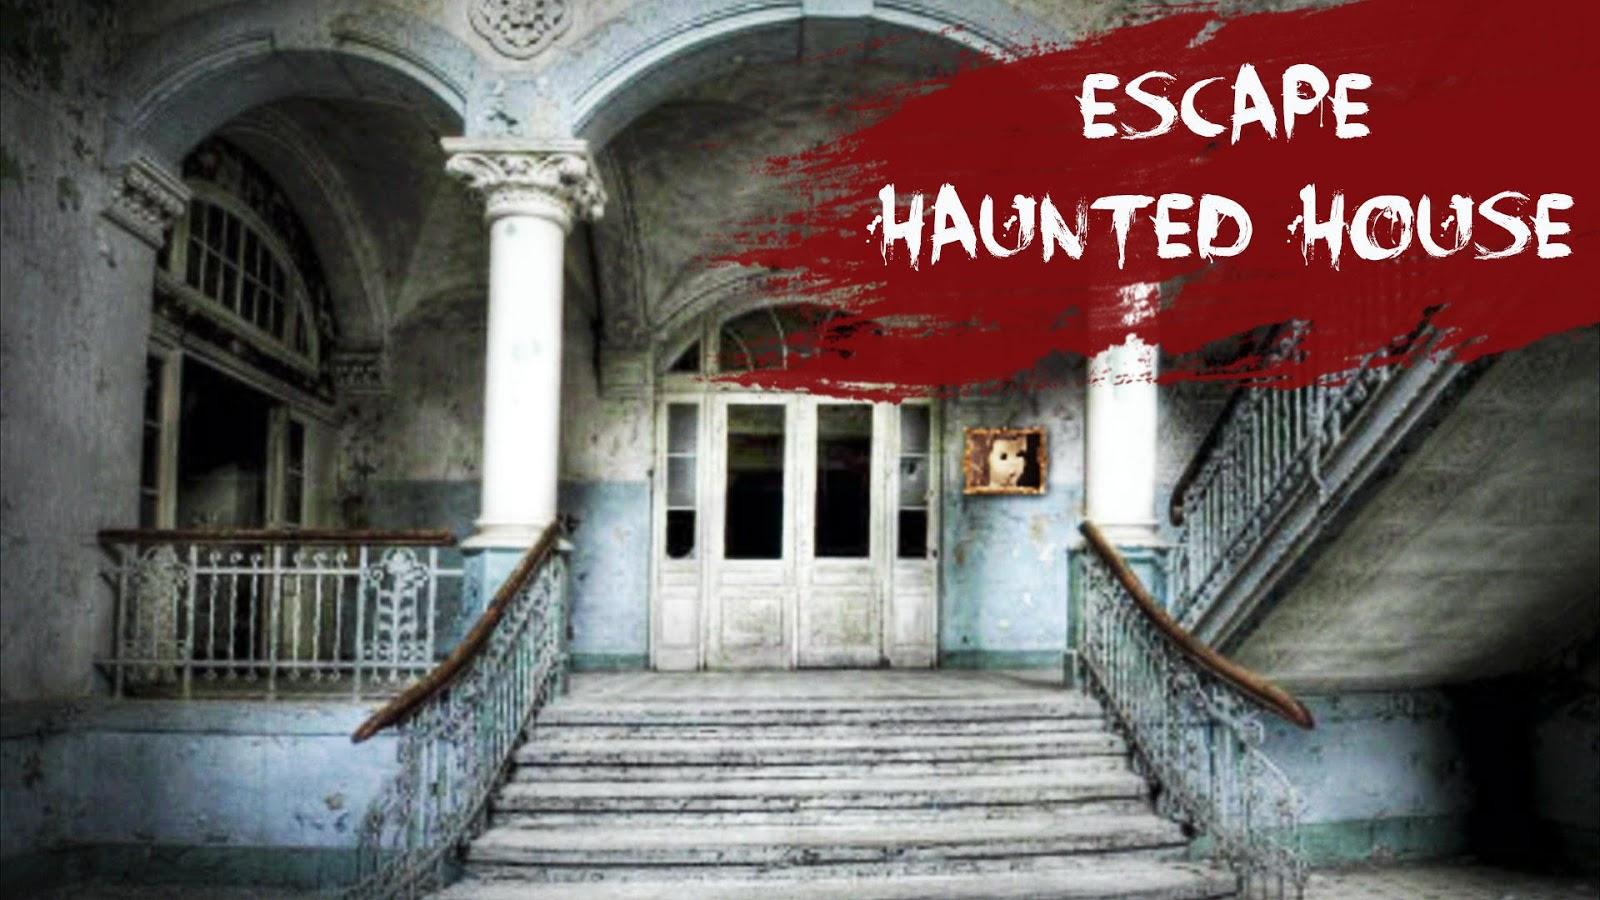 Drawn haunted house classic On Escape House Escape Google